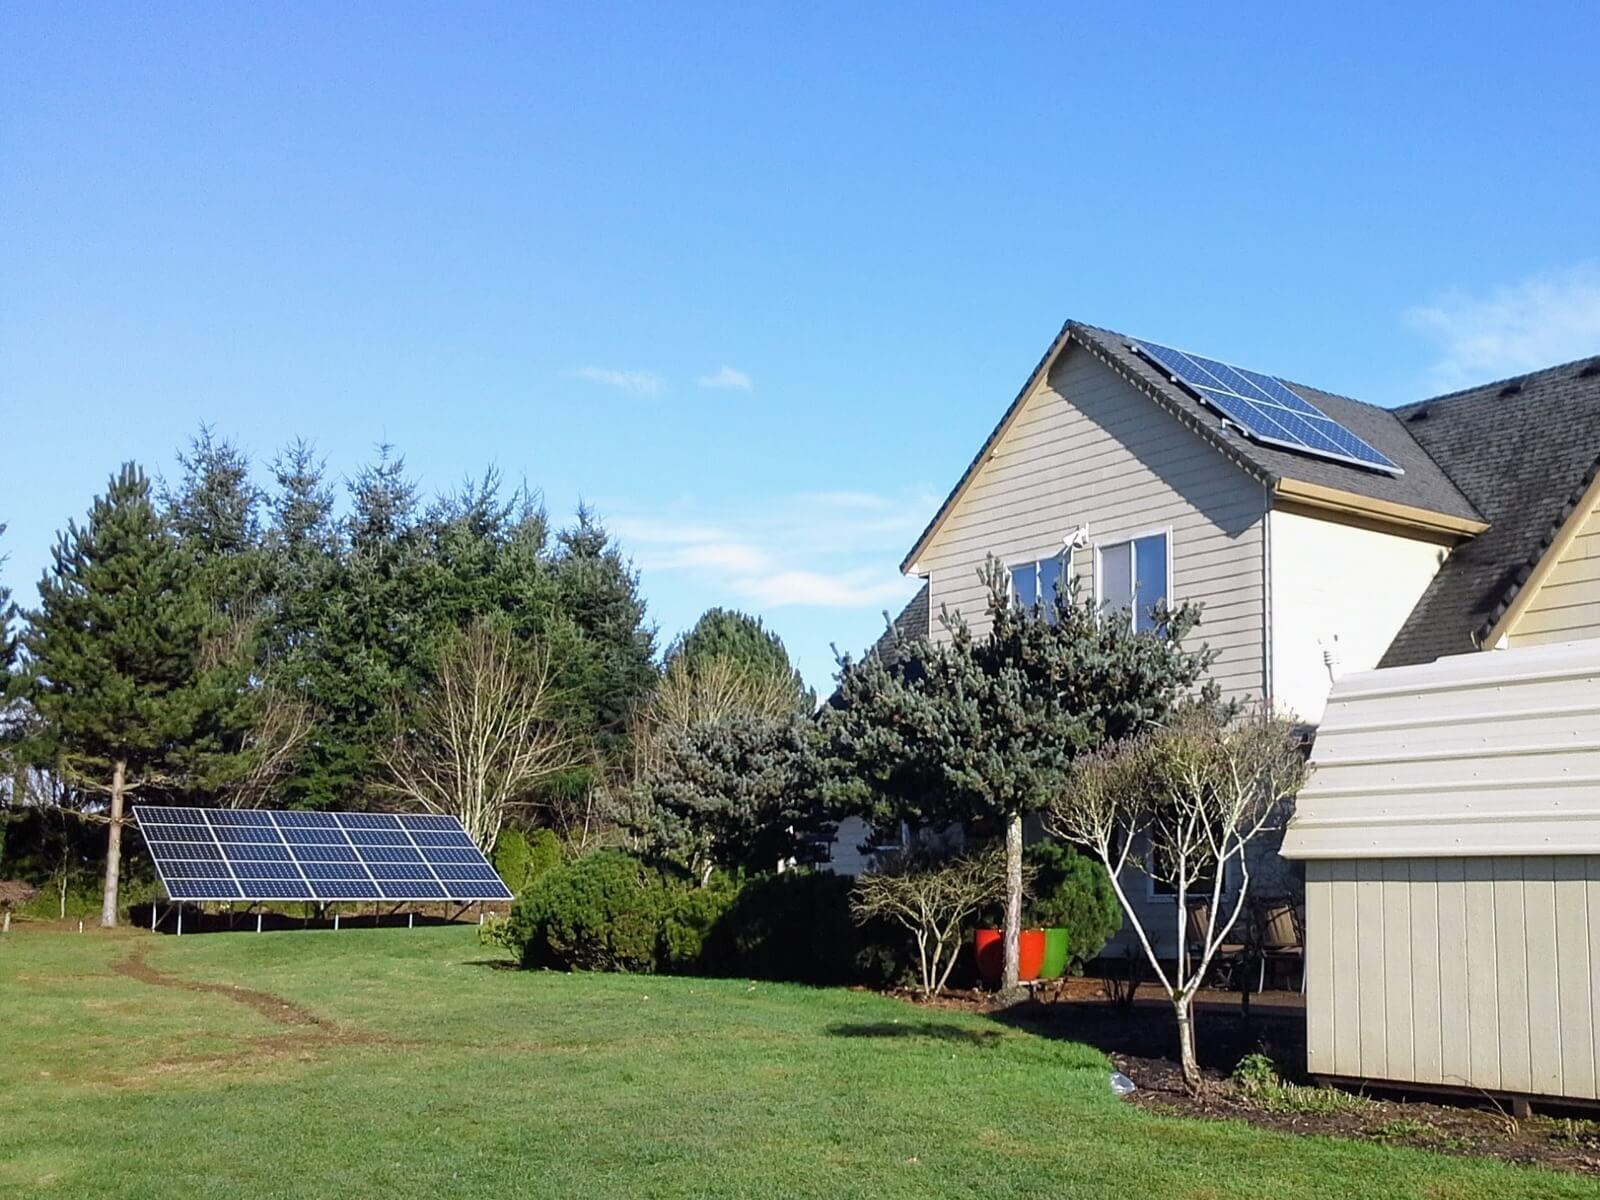 solar roof ground mount system battle ground.jpeg